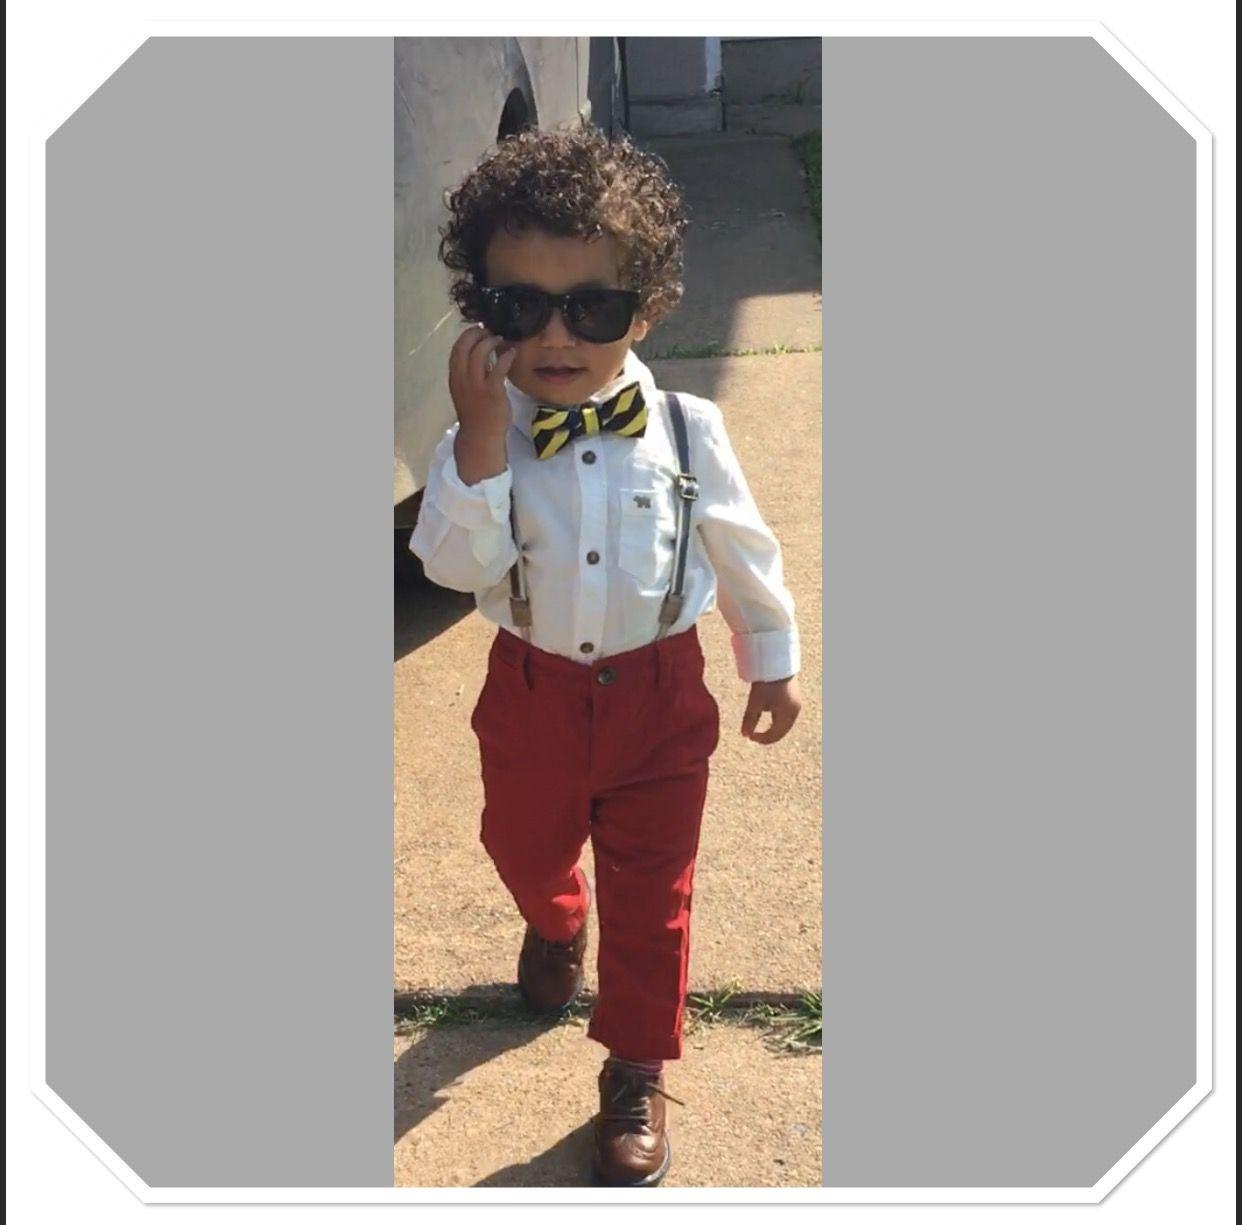 Baby Boy Fashion, Bow tie, suspenders, wingtips, curls, toddler